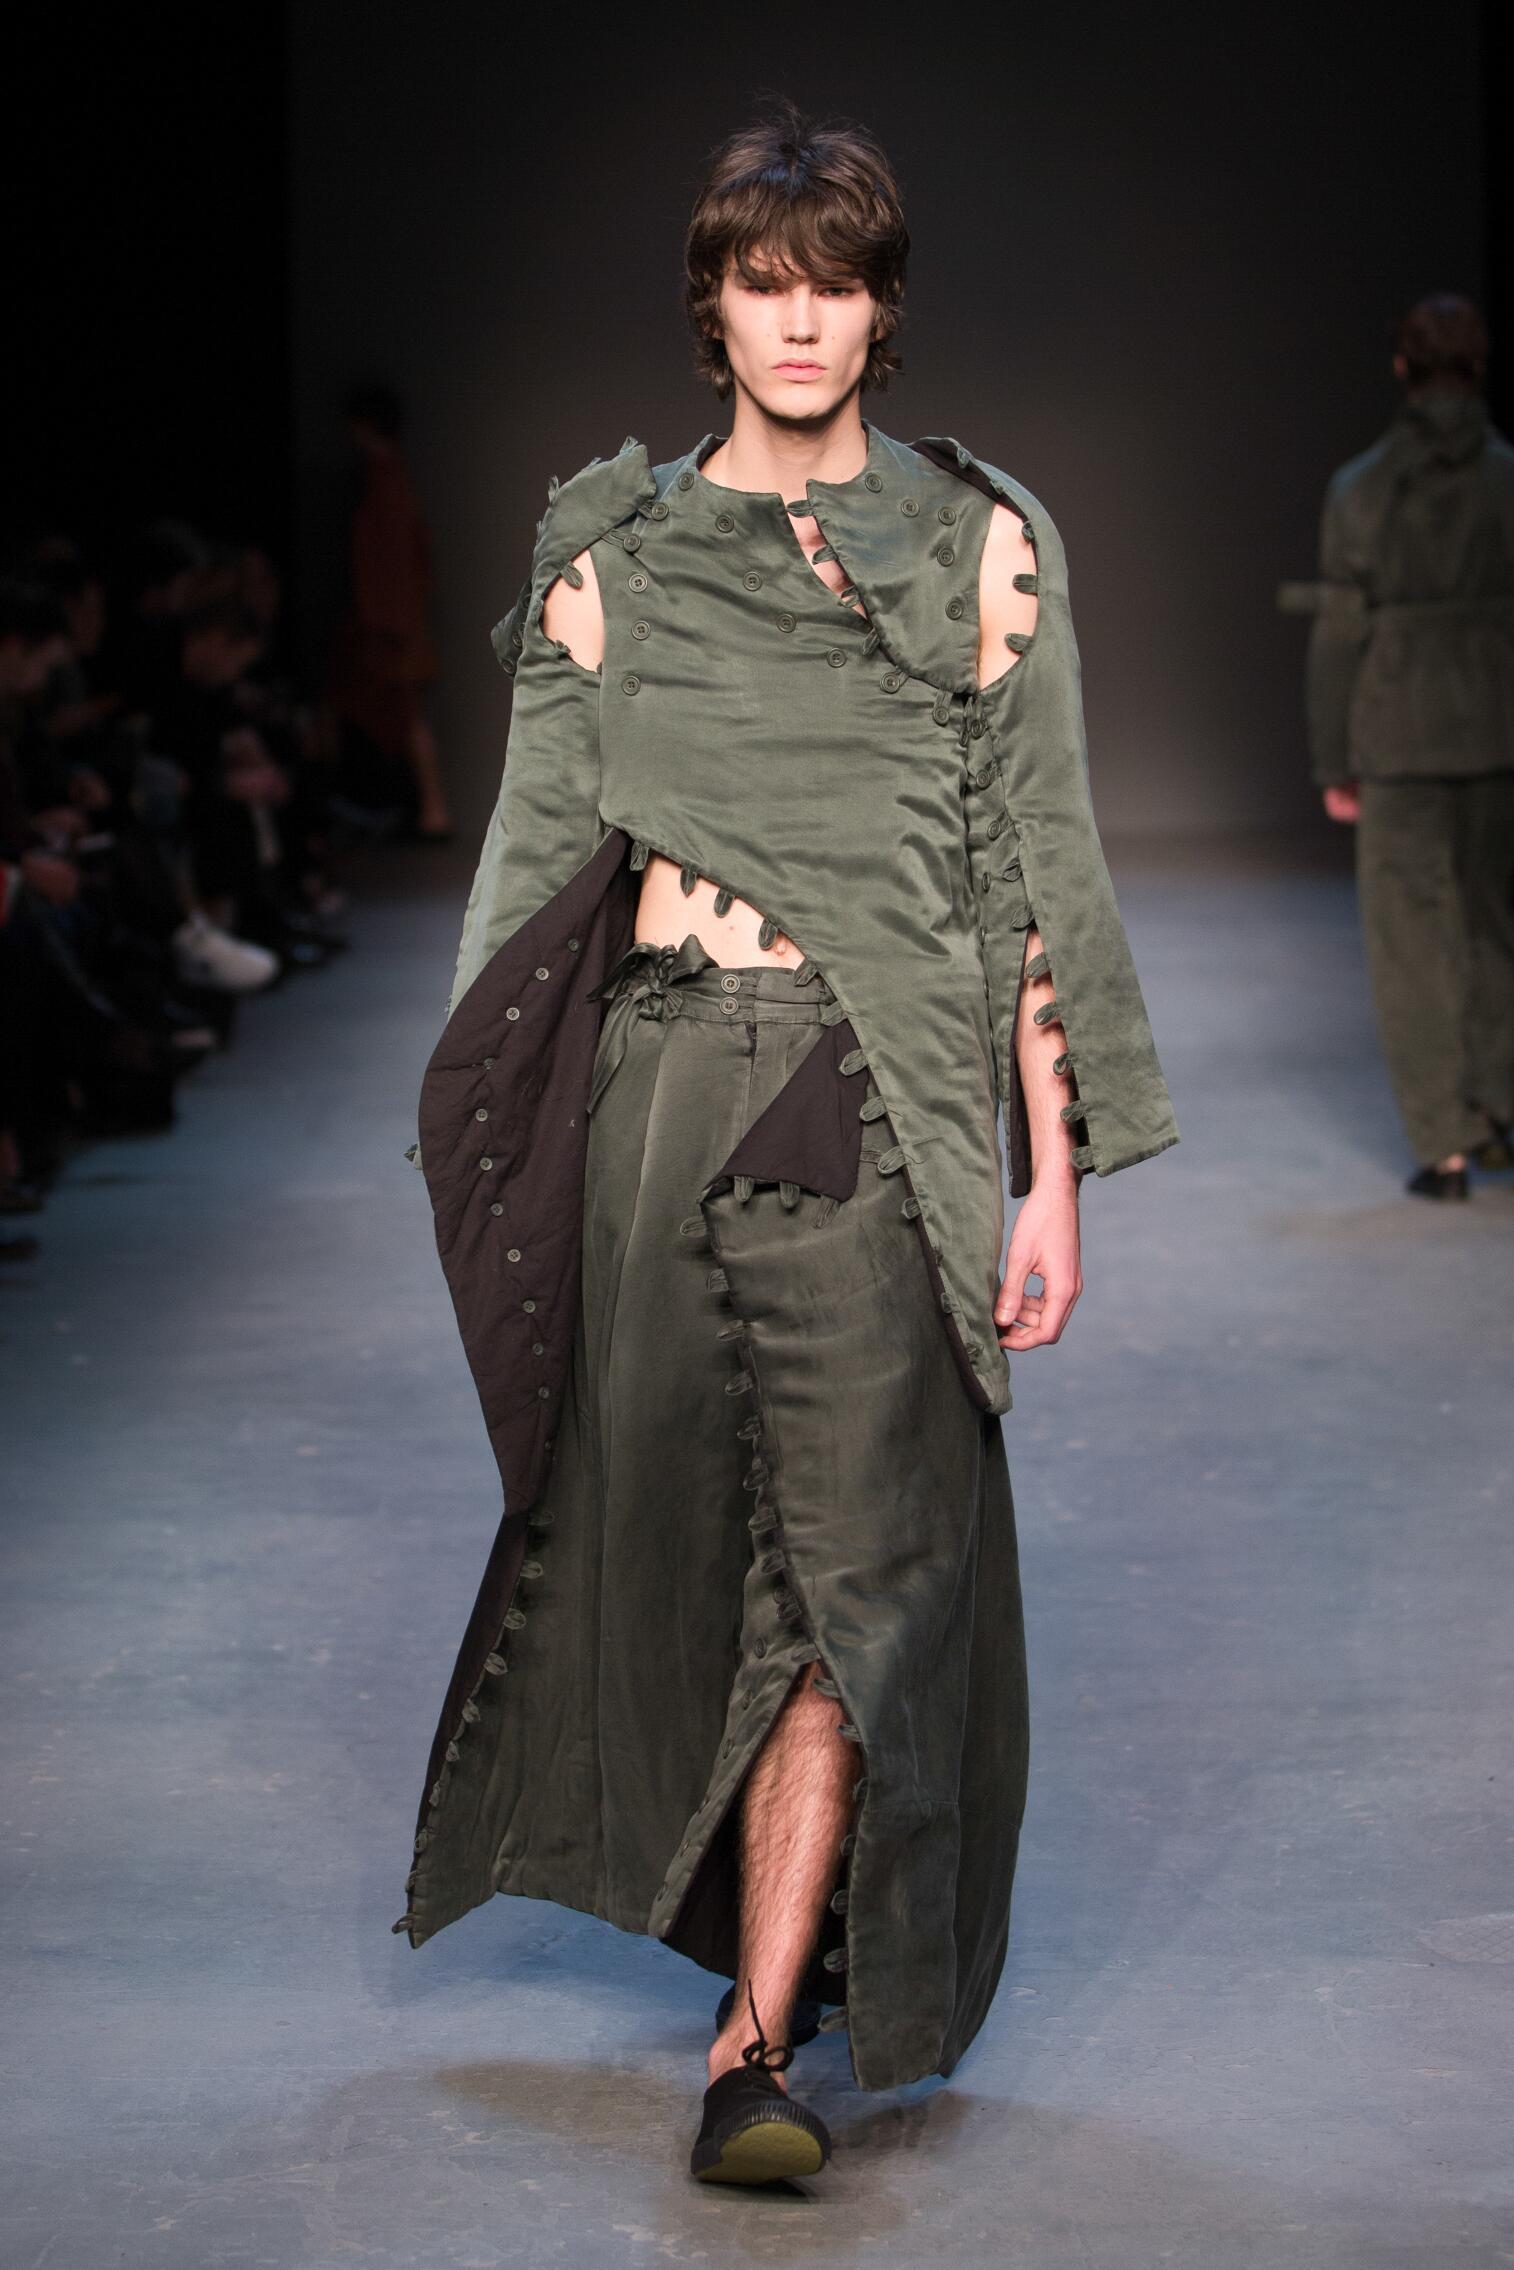 Winter Fashion Trends 2016 17 Craig Green